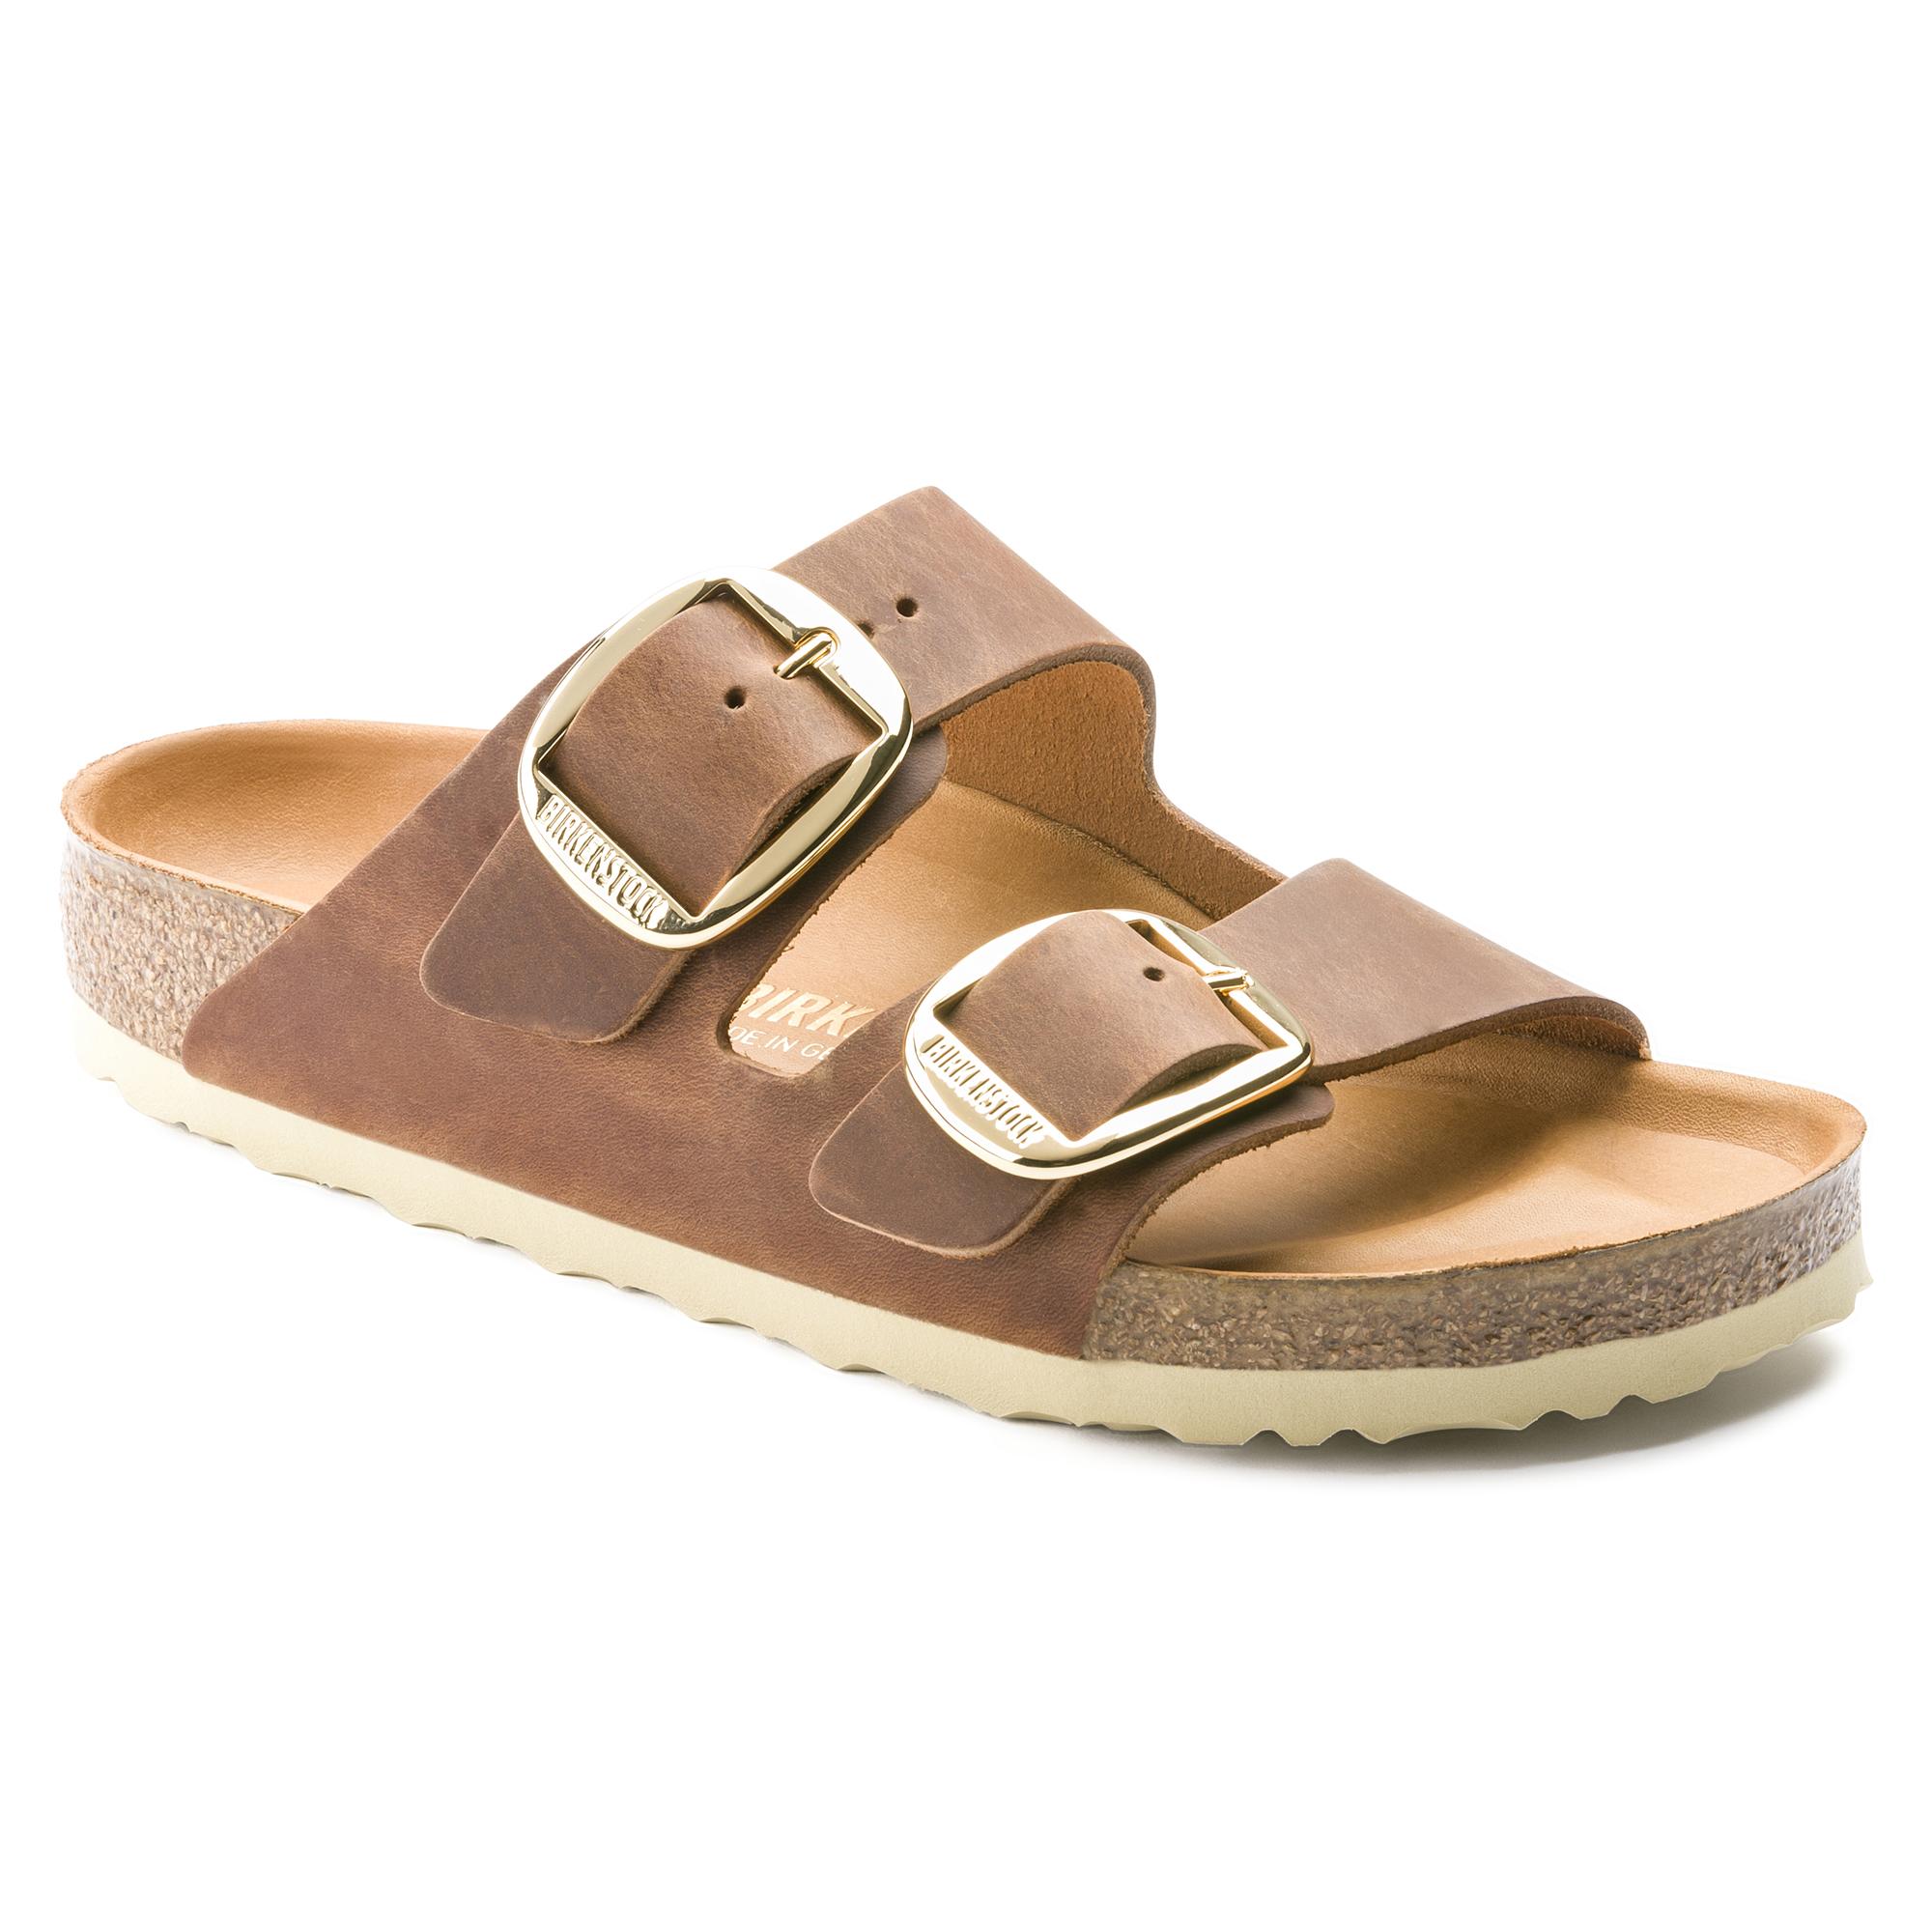 Birkenstock Arizona Big Buckle sandal